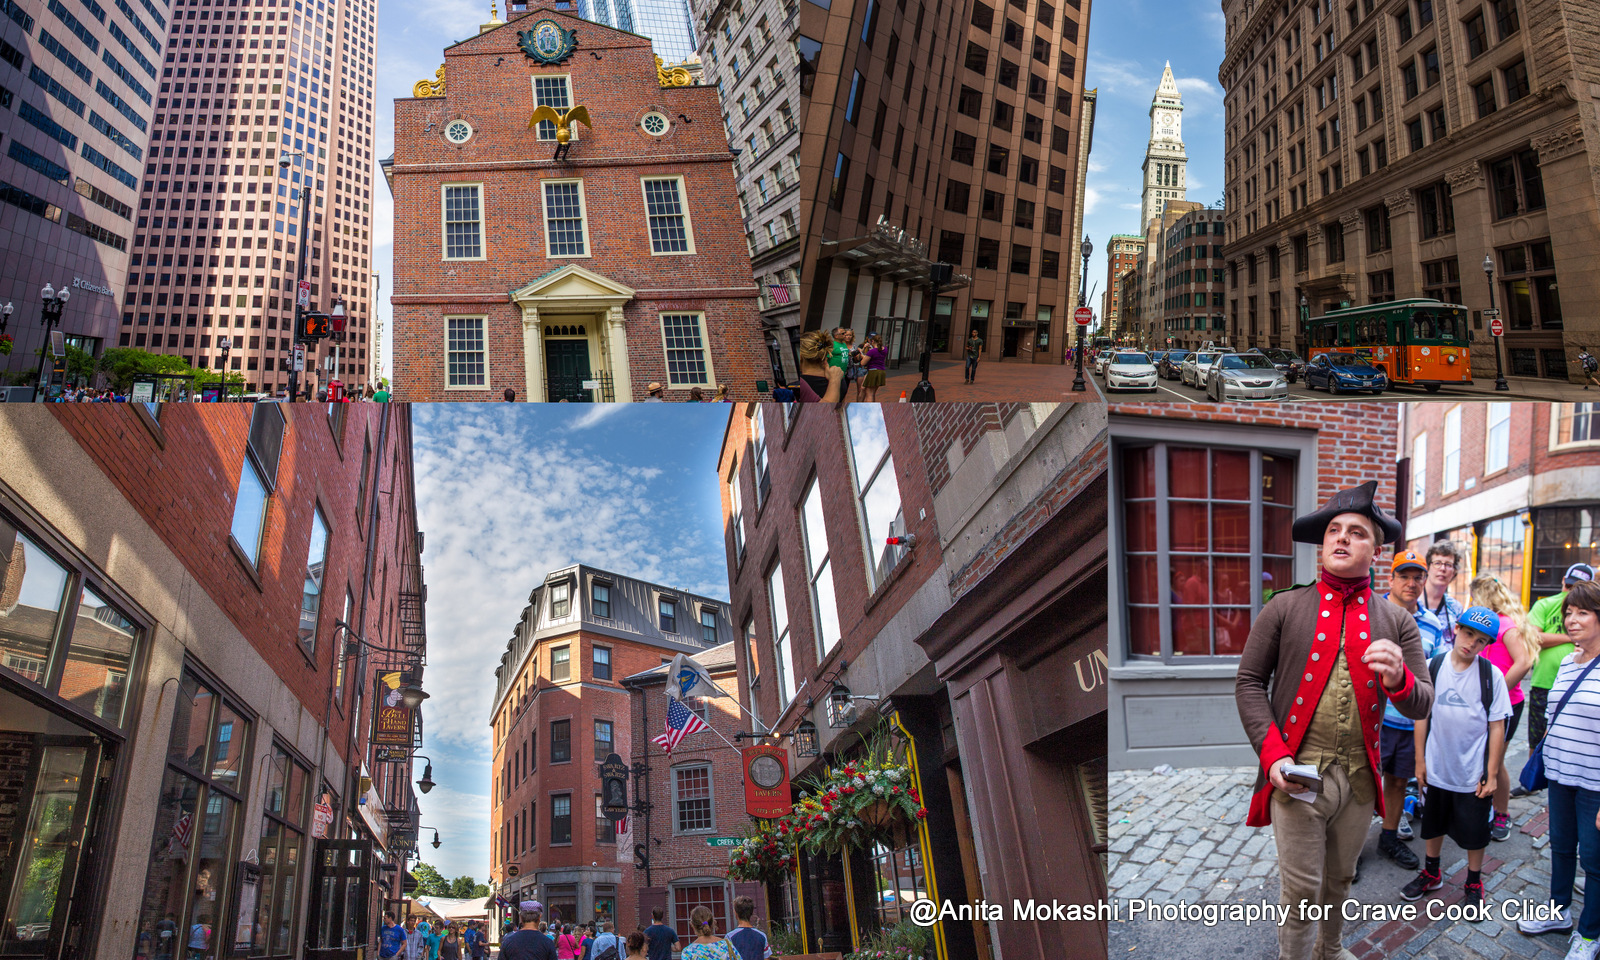 boston travelogue, boston itinerary, boston common, harvard square, harvard university, boston library, freedom trail, boston common, boston cream pie, boston pier, mikes place, MIT, travel blog, must do things in boston